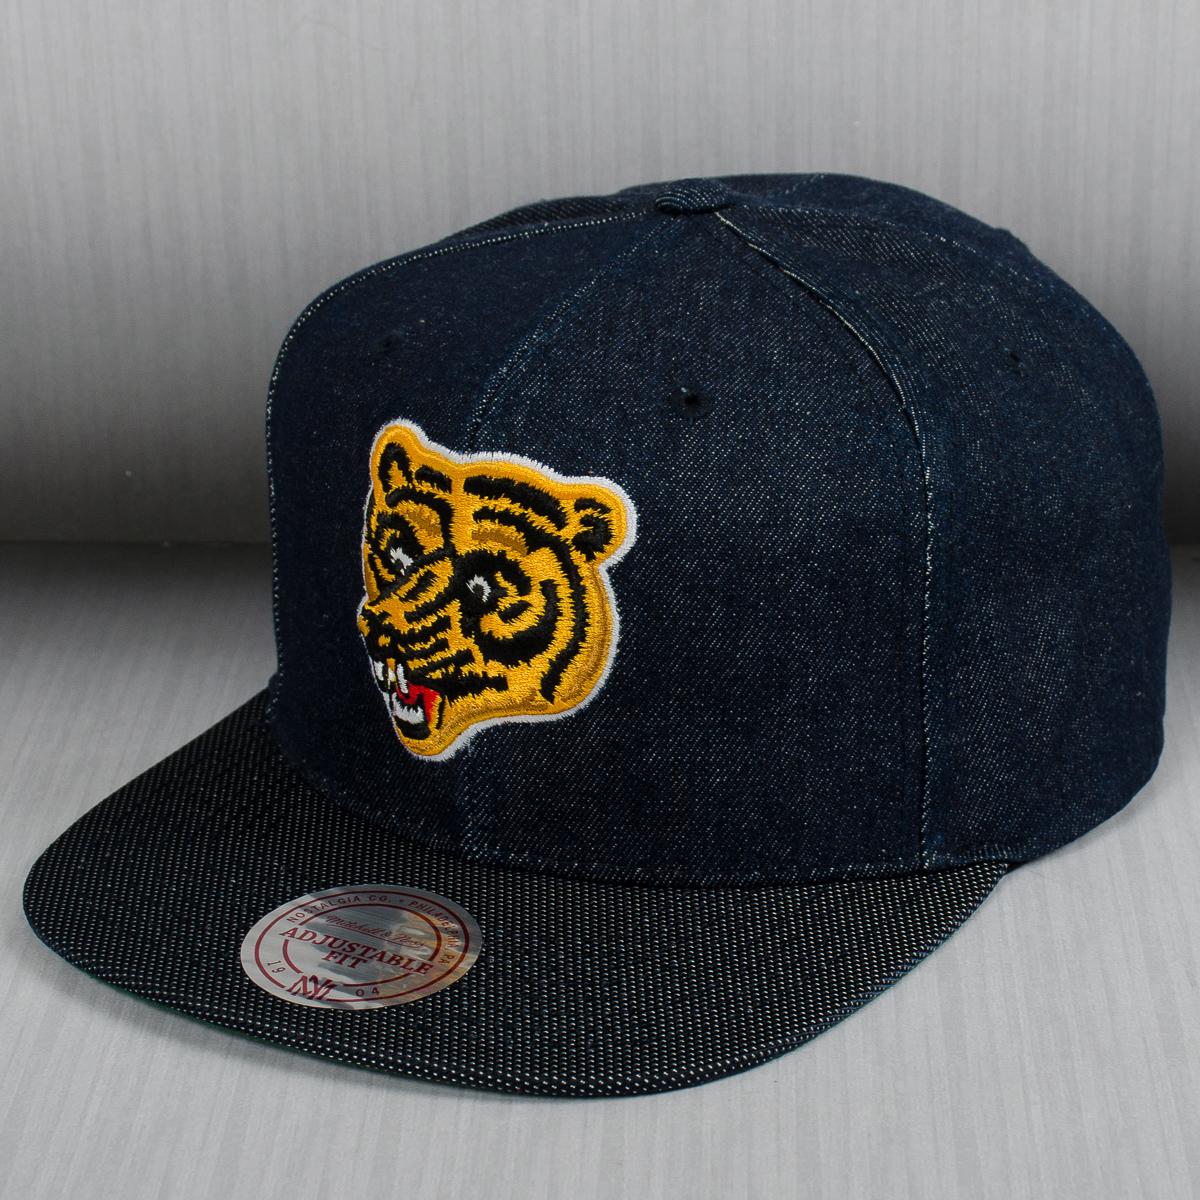 Mitchell   Ness NHL Boston Bruins Raw Denim Snapback Cap - MLB NFL ... 6d293aee09c